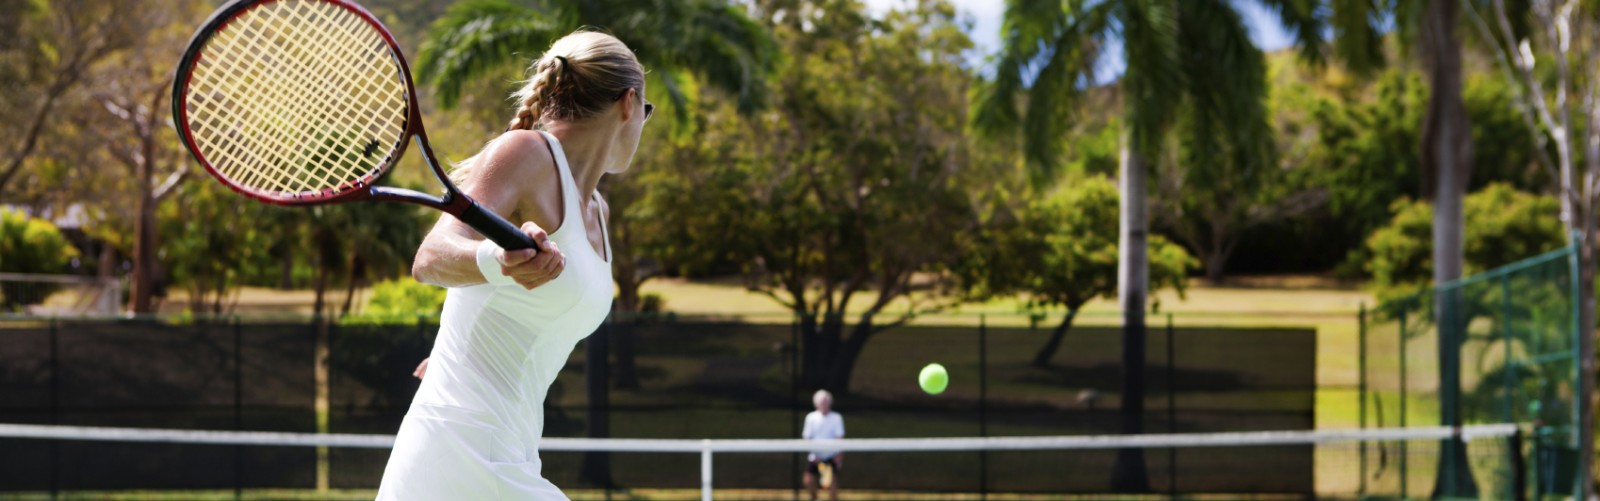 Grand Bahama tennis